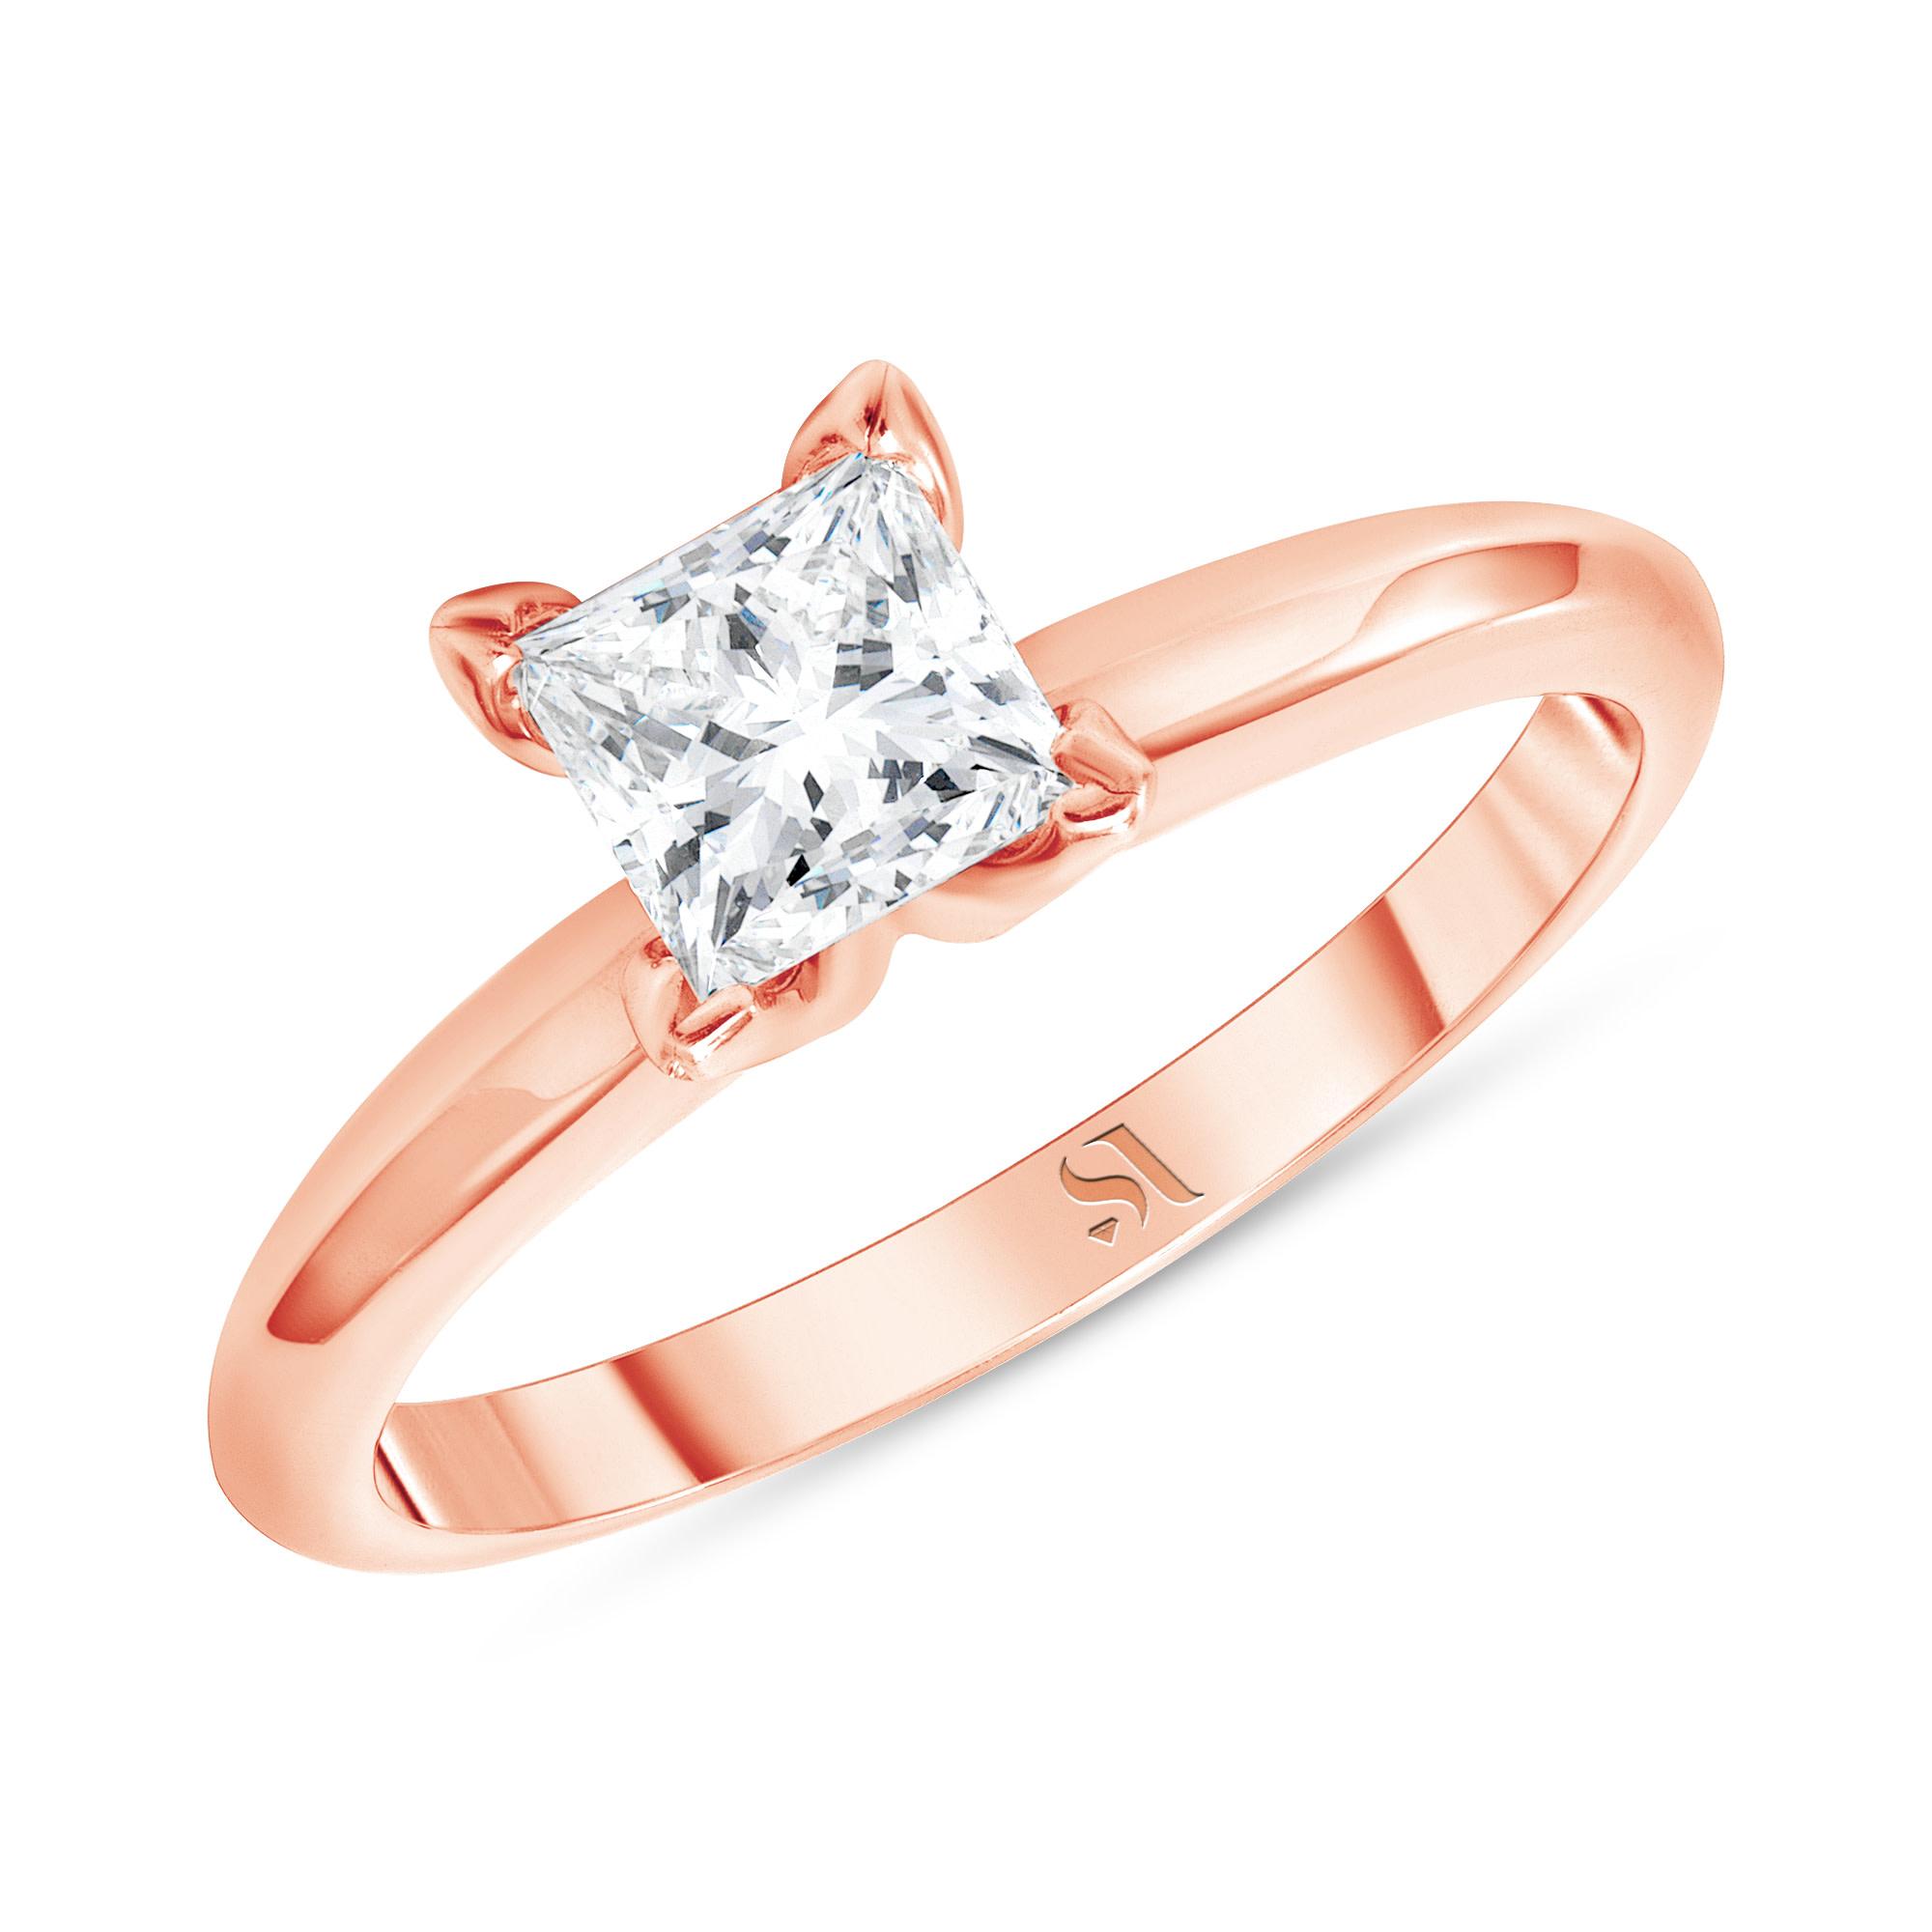 Princess Cut Diamond Engagement Ring - Rose Gold